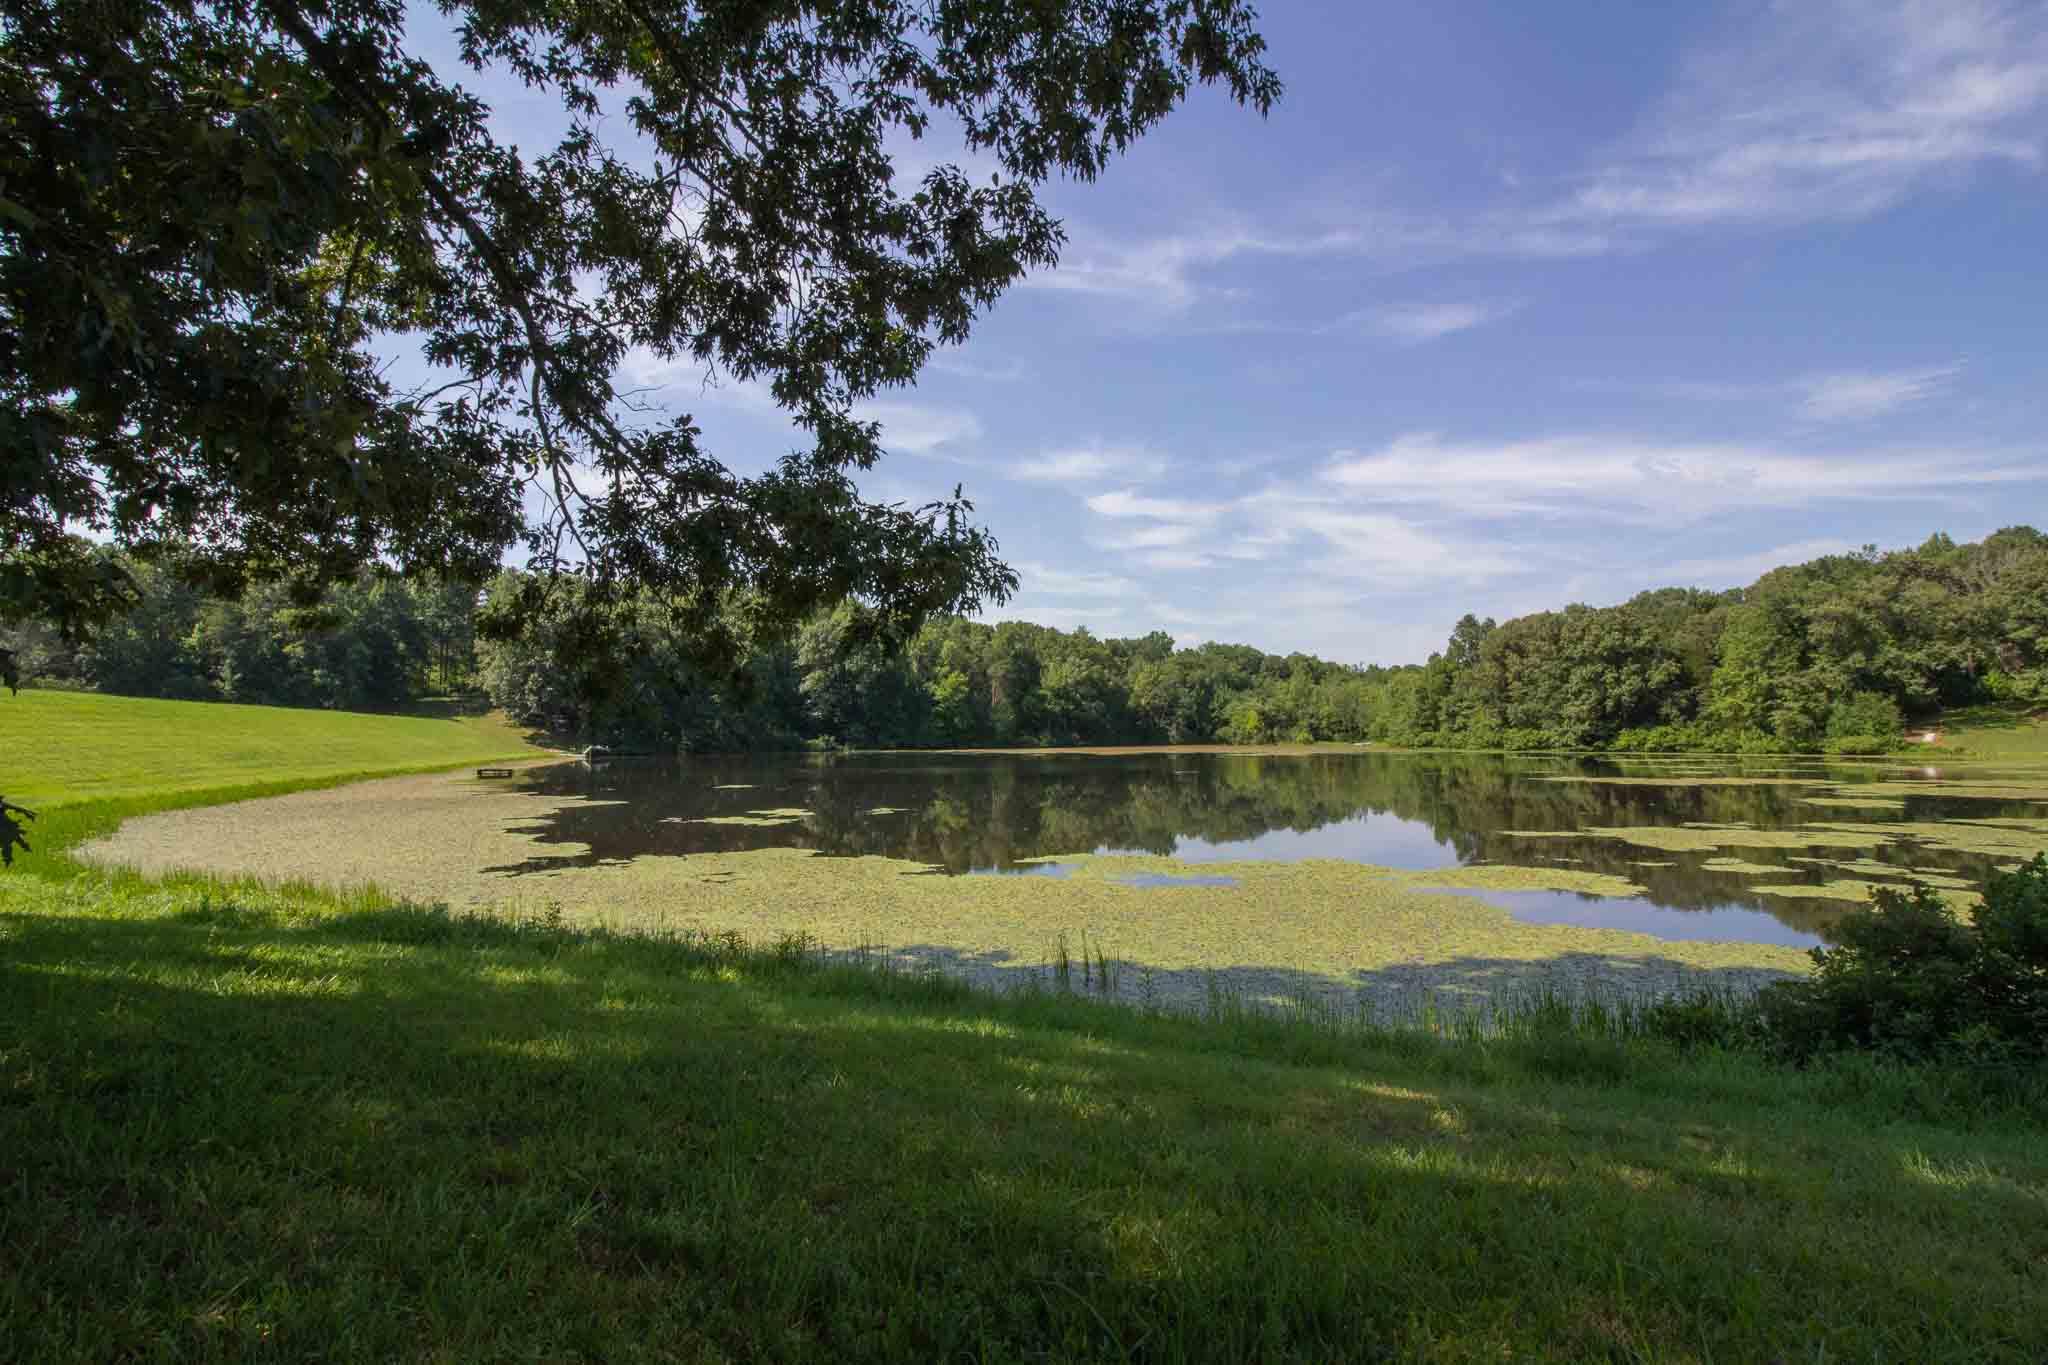 Lake Property for Sale, Stockton Lake, Lot 17